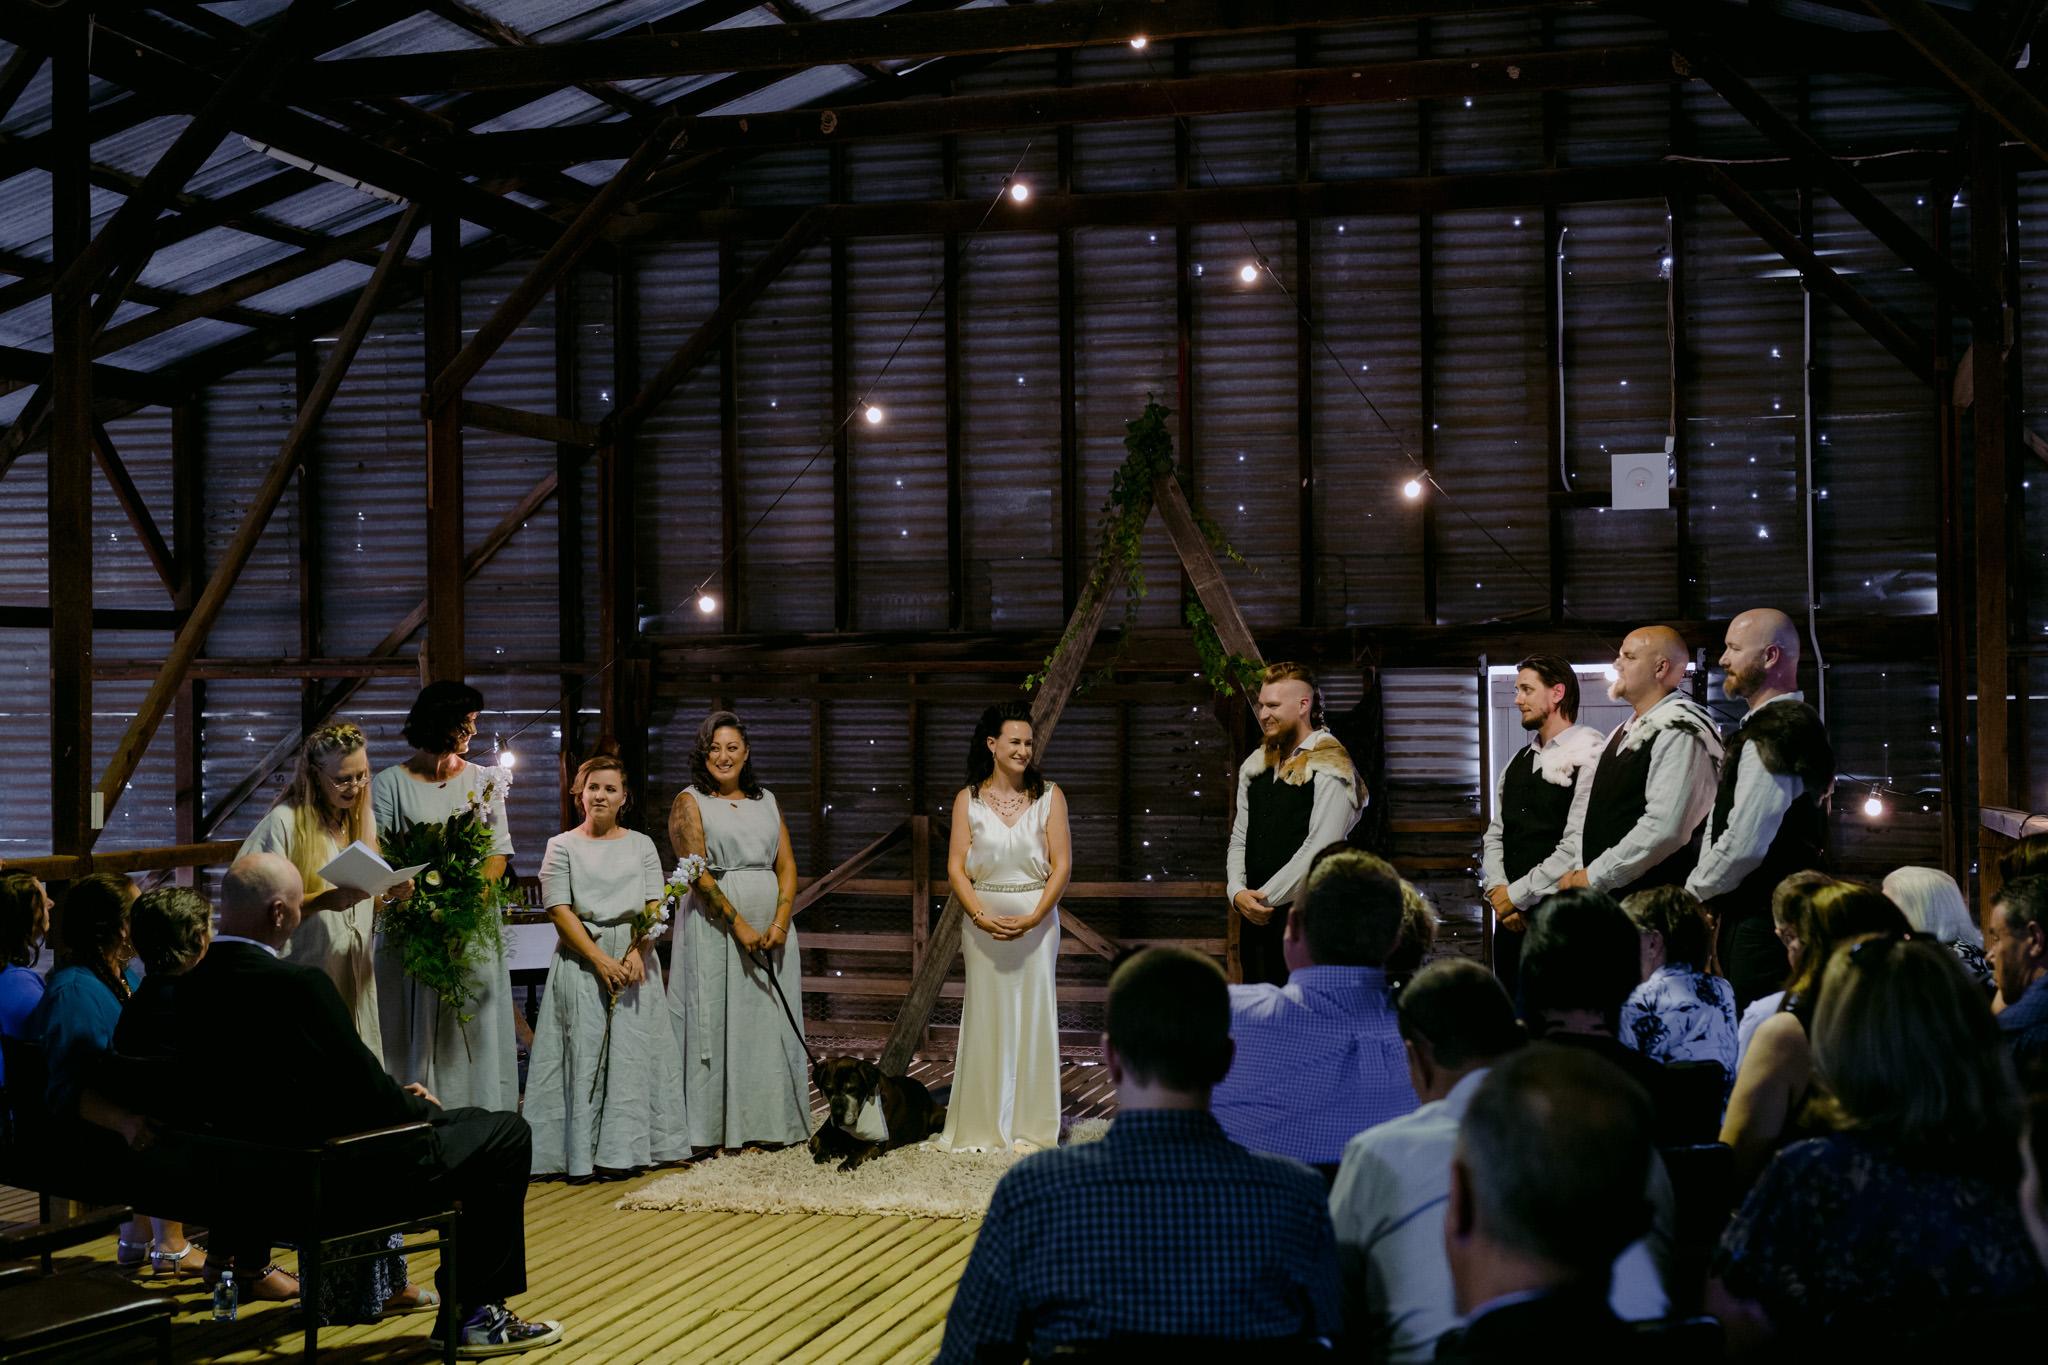 Yarralumla Woolshed Canberra Wedding Photographer Erin Latimore_080.JPG